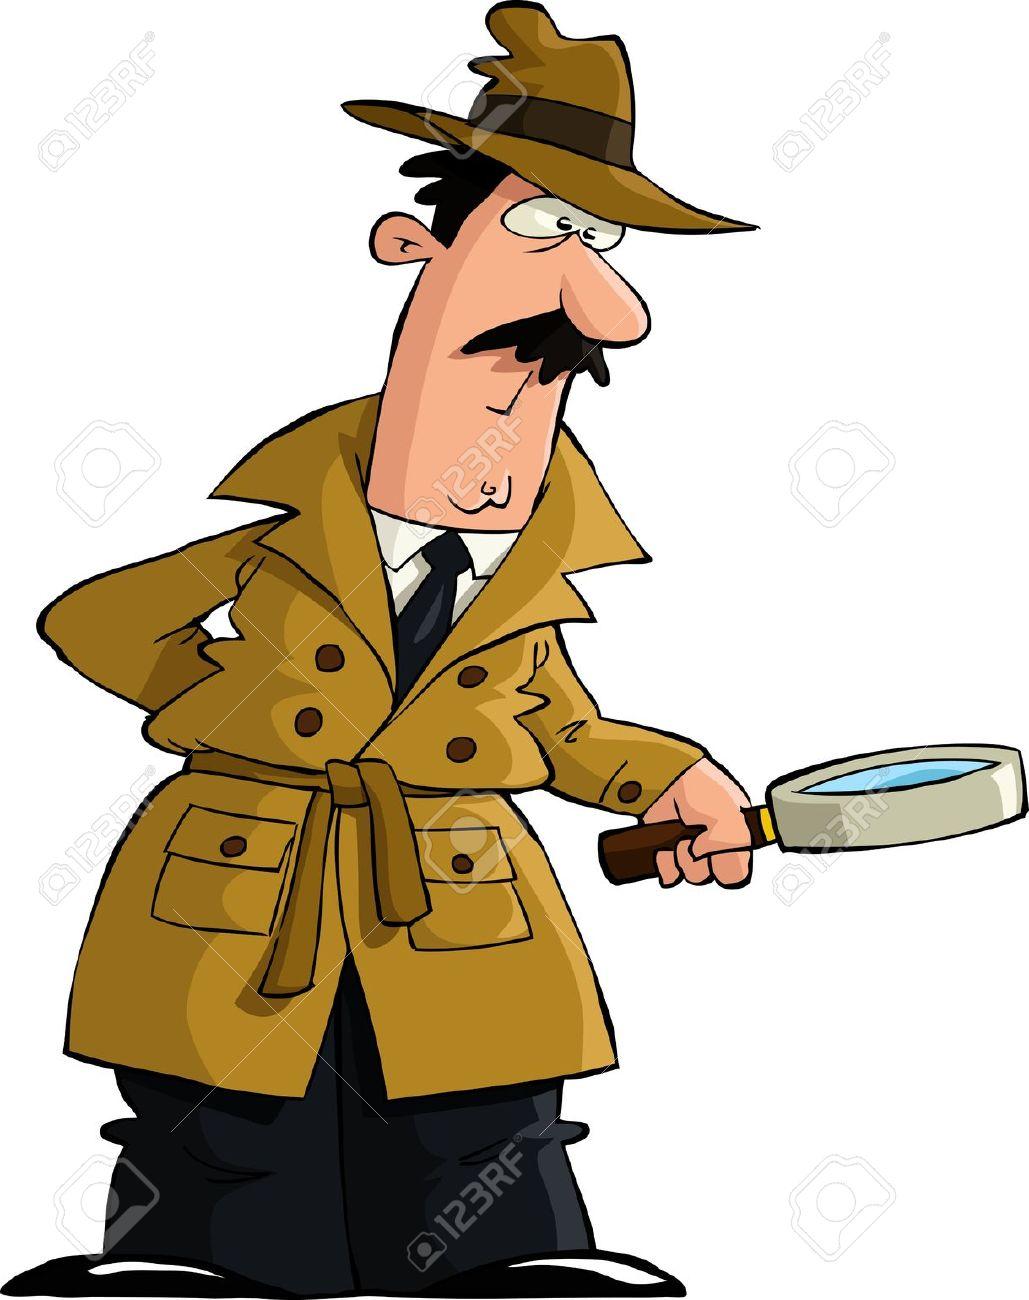 Mann mit lupe clipart free library Detektiv mit lupe clipart - ClipartFox free library